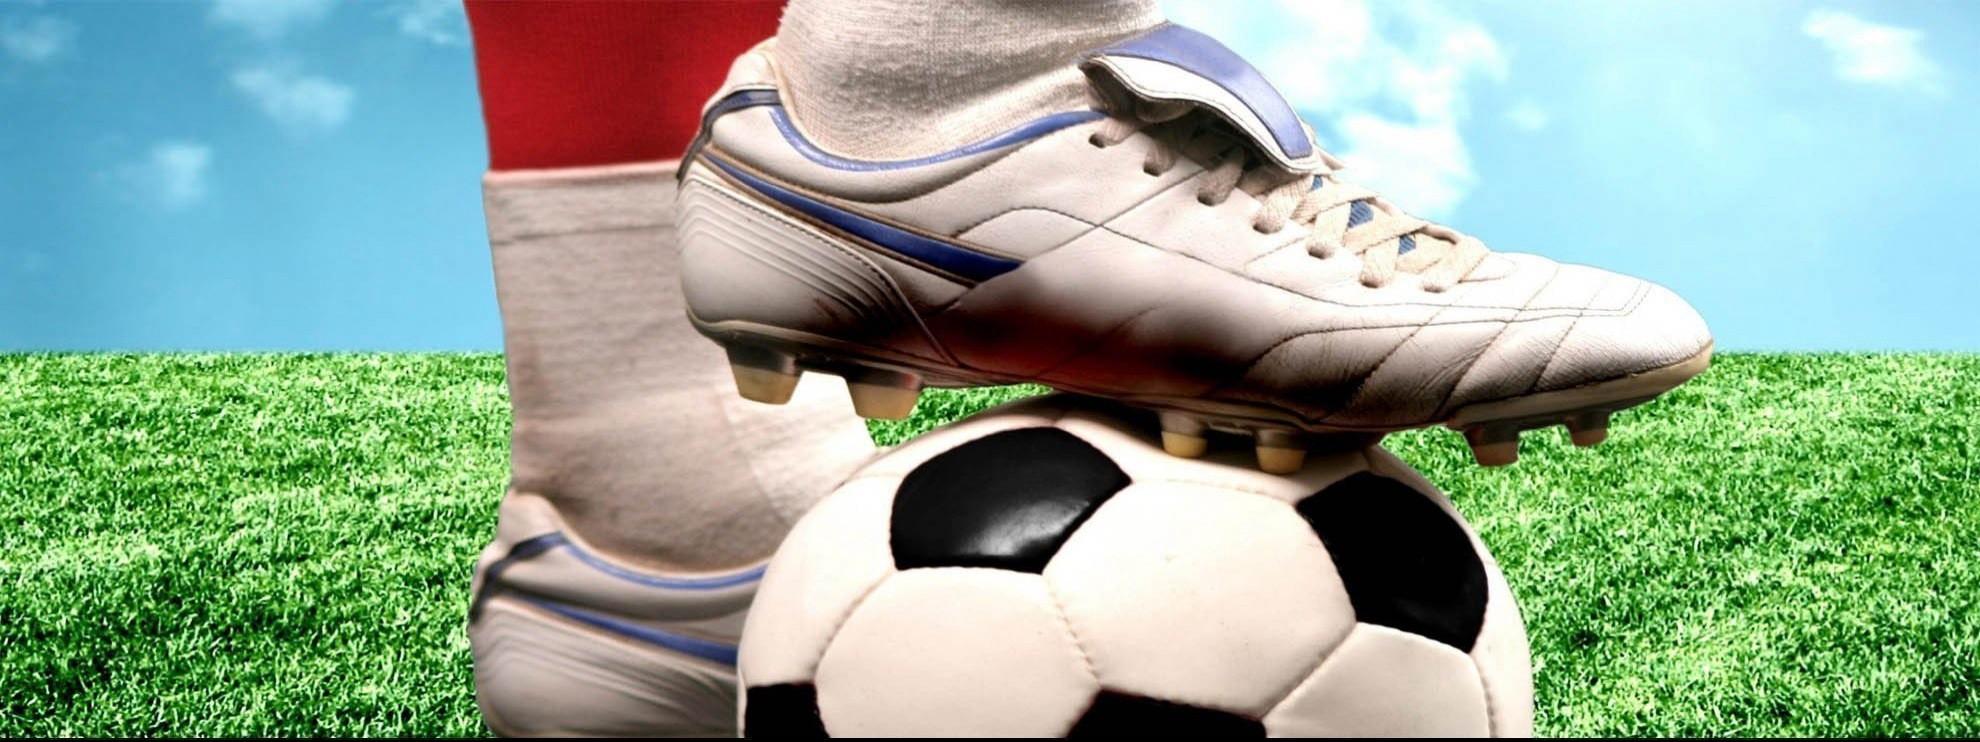 performer The national football team of Belarus